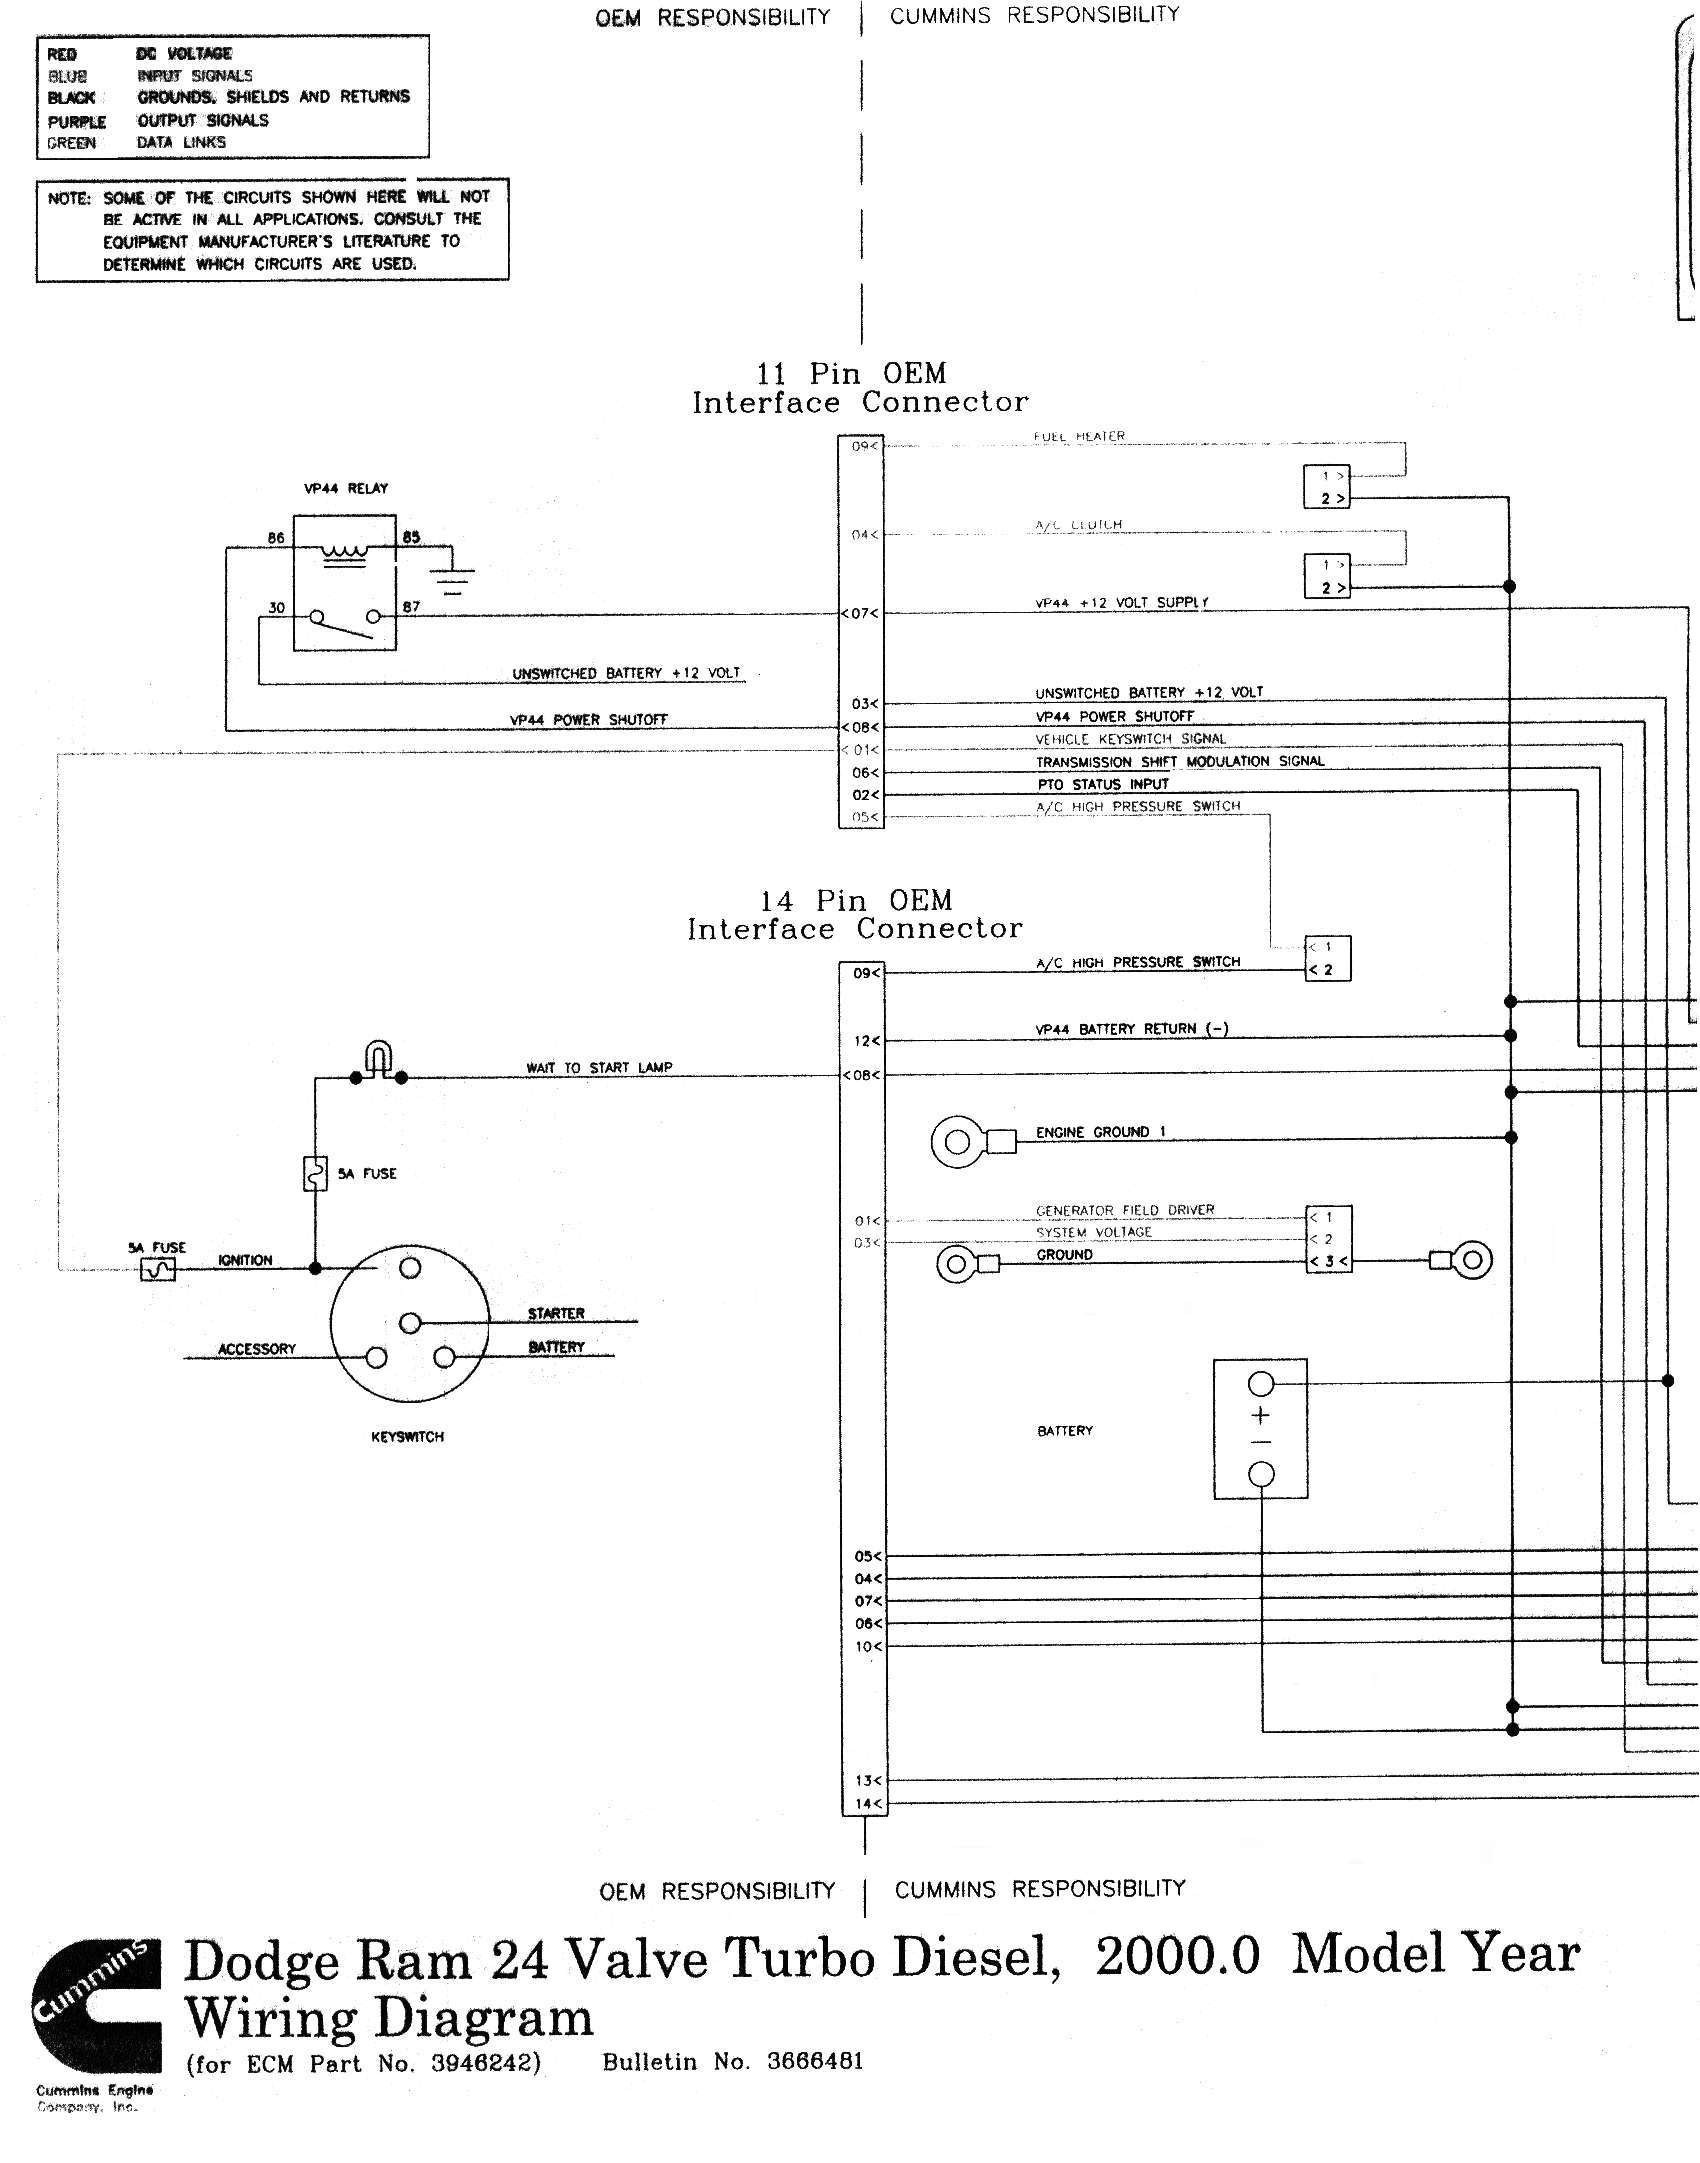 [SCHEMATICS_4FR]  RY_7890] Wiring Diagram For 2005 Dodge Ram 2500 Schematic Wiring | 05 Dodge Ram Wiring Diagram |  | Hete Elec Ogeno Dome Mohammedshrine Librar Wiring 101